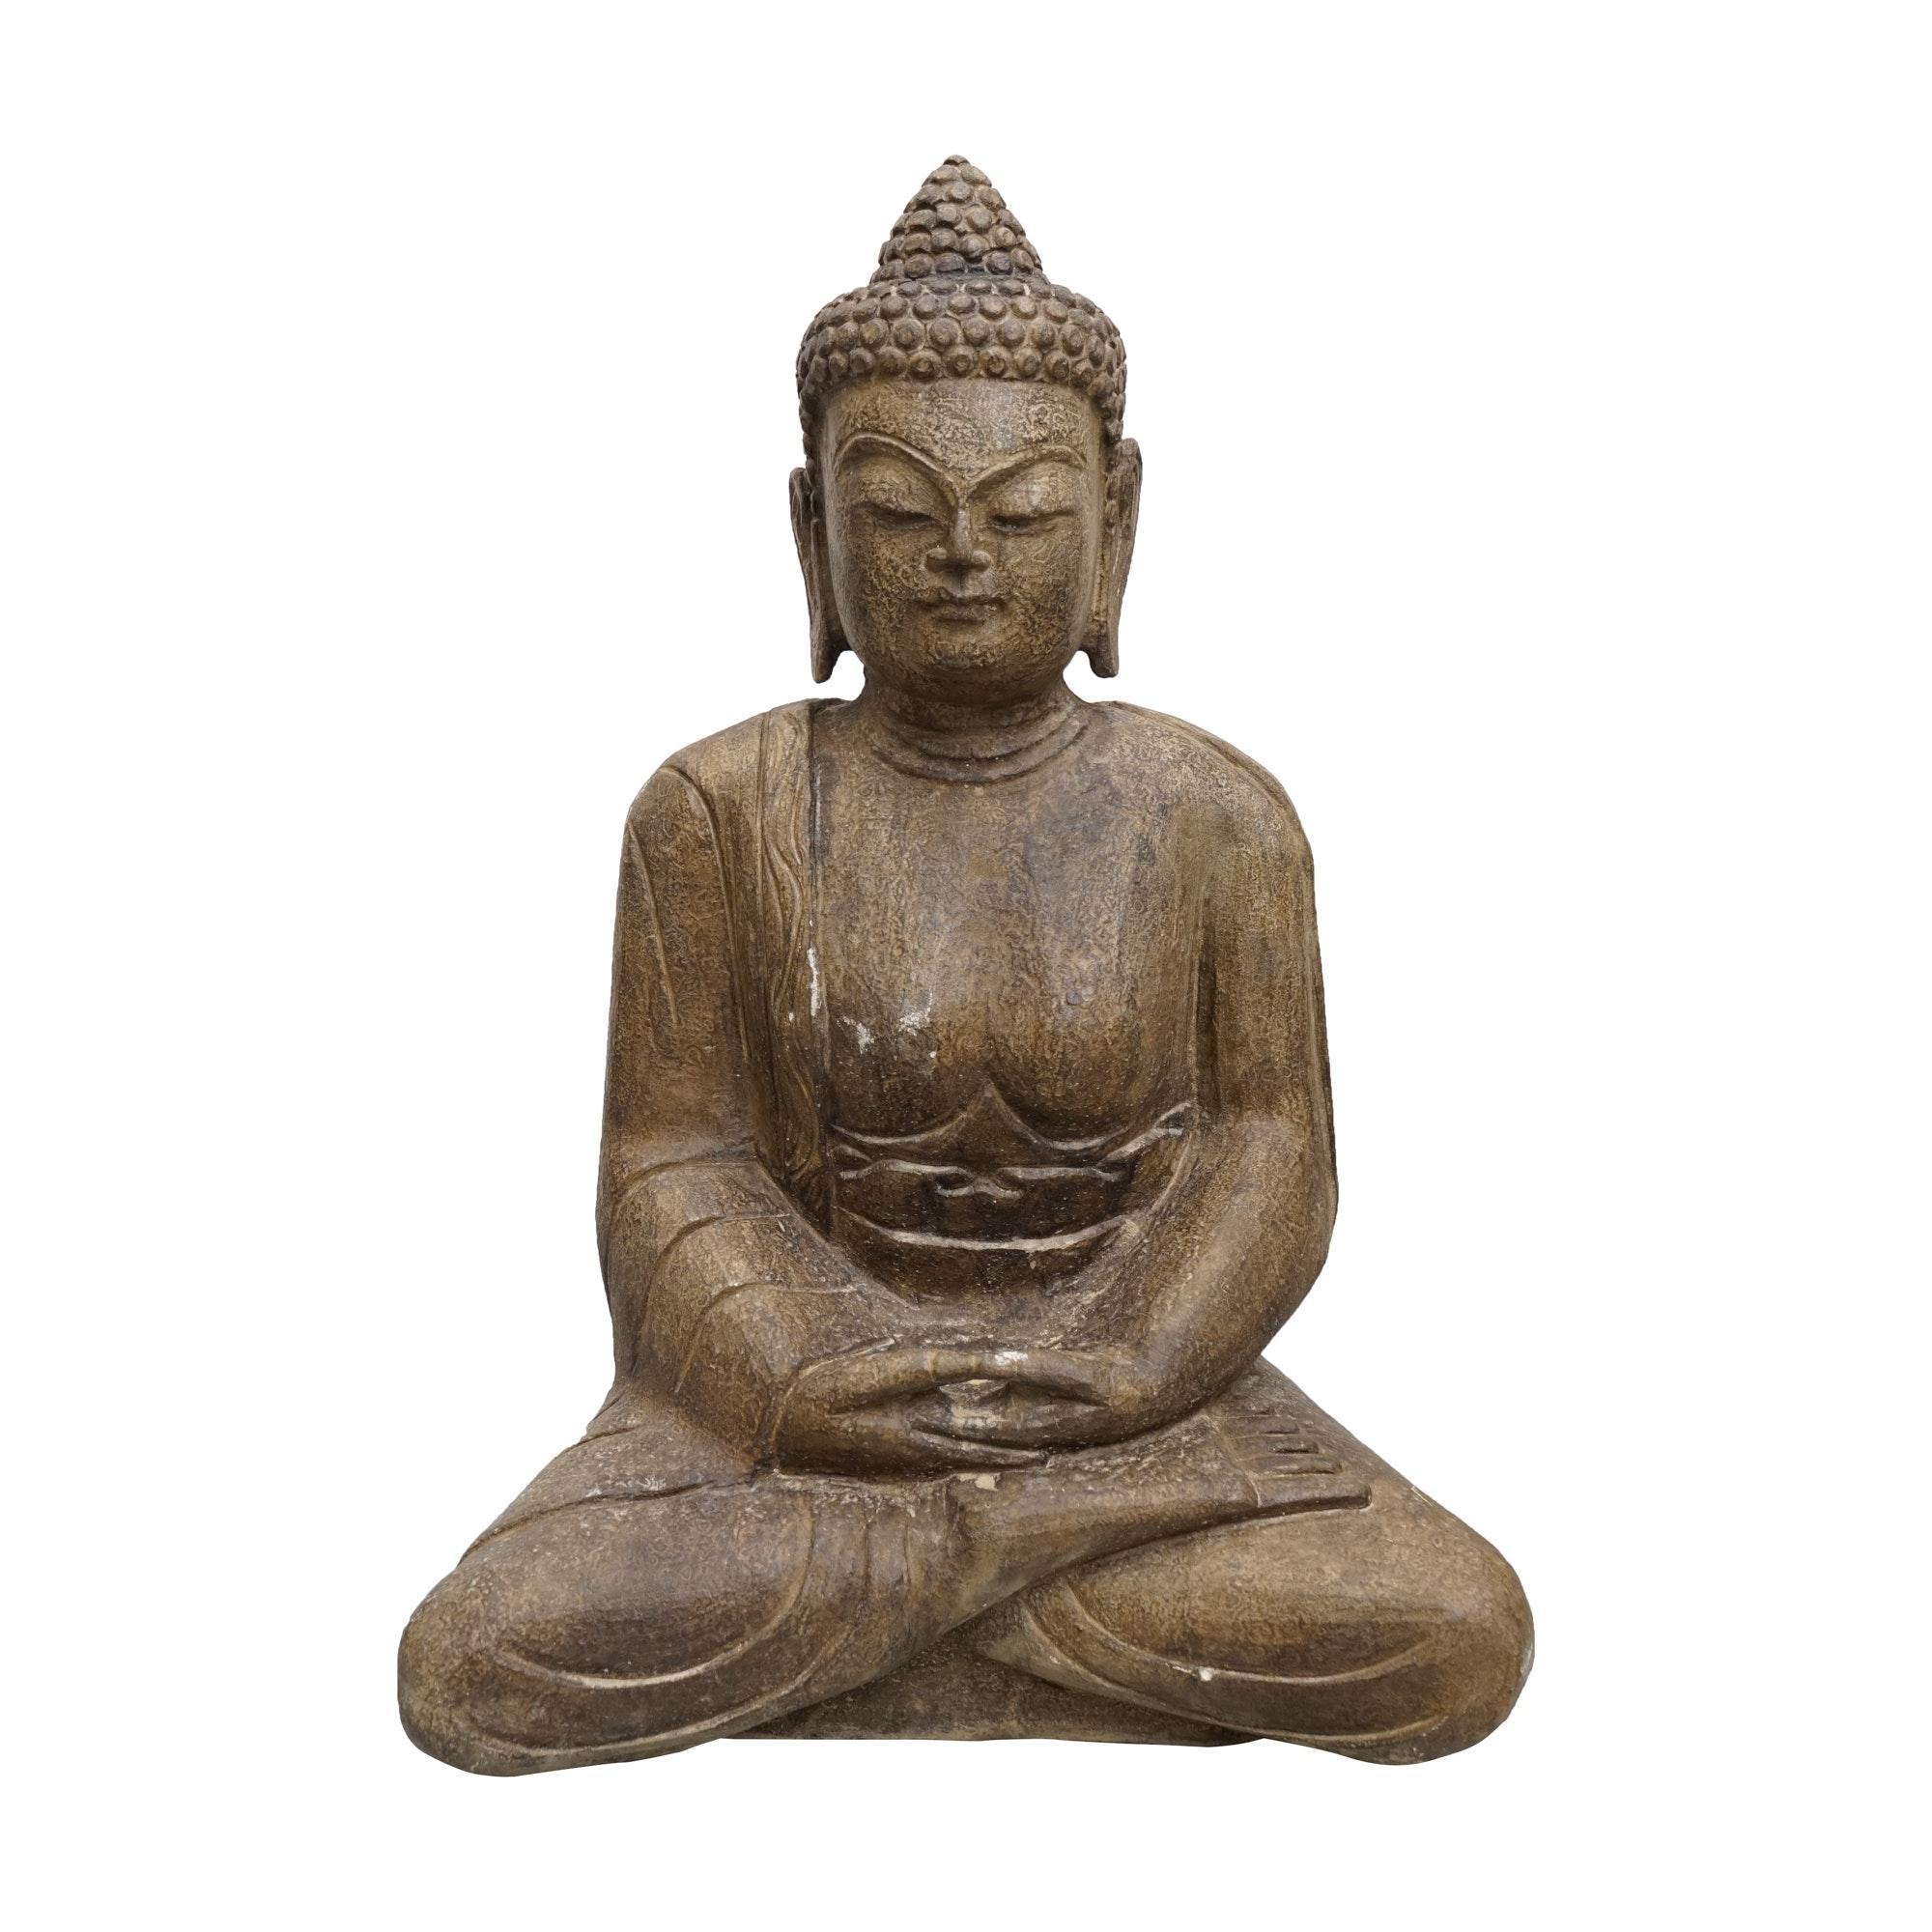 Stone Buddha Sculpture